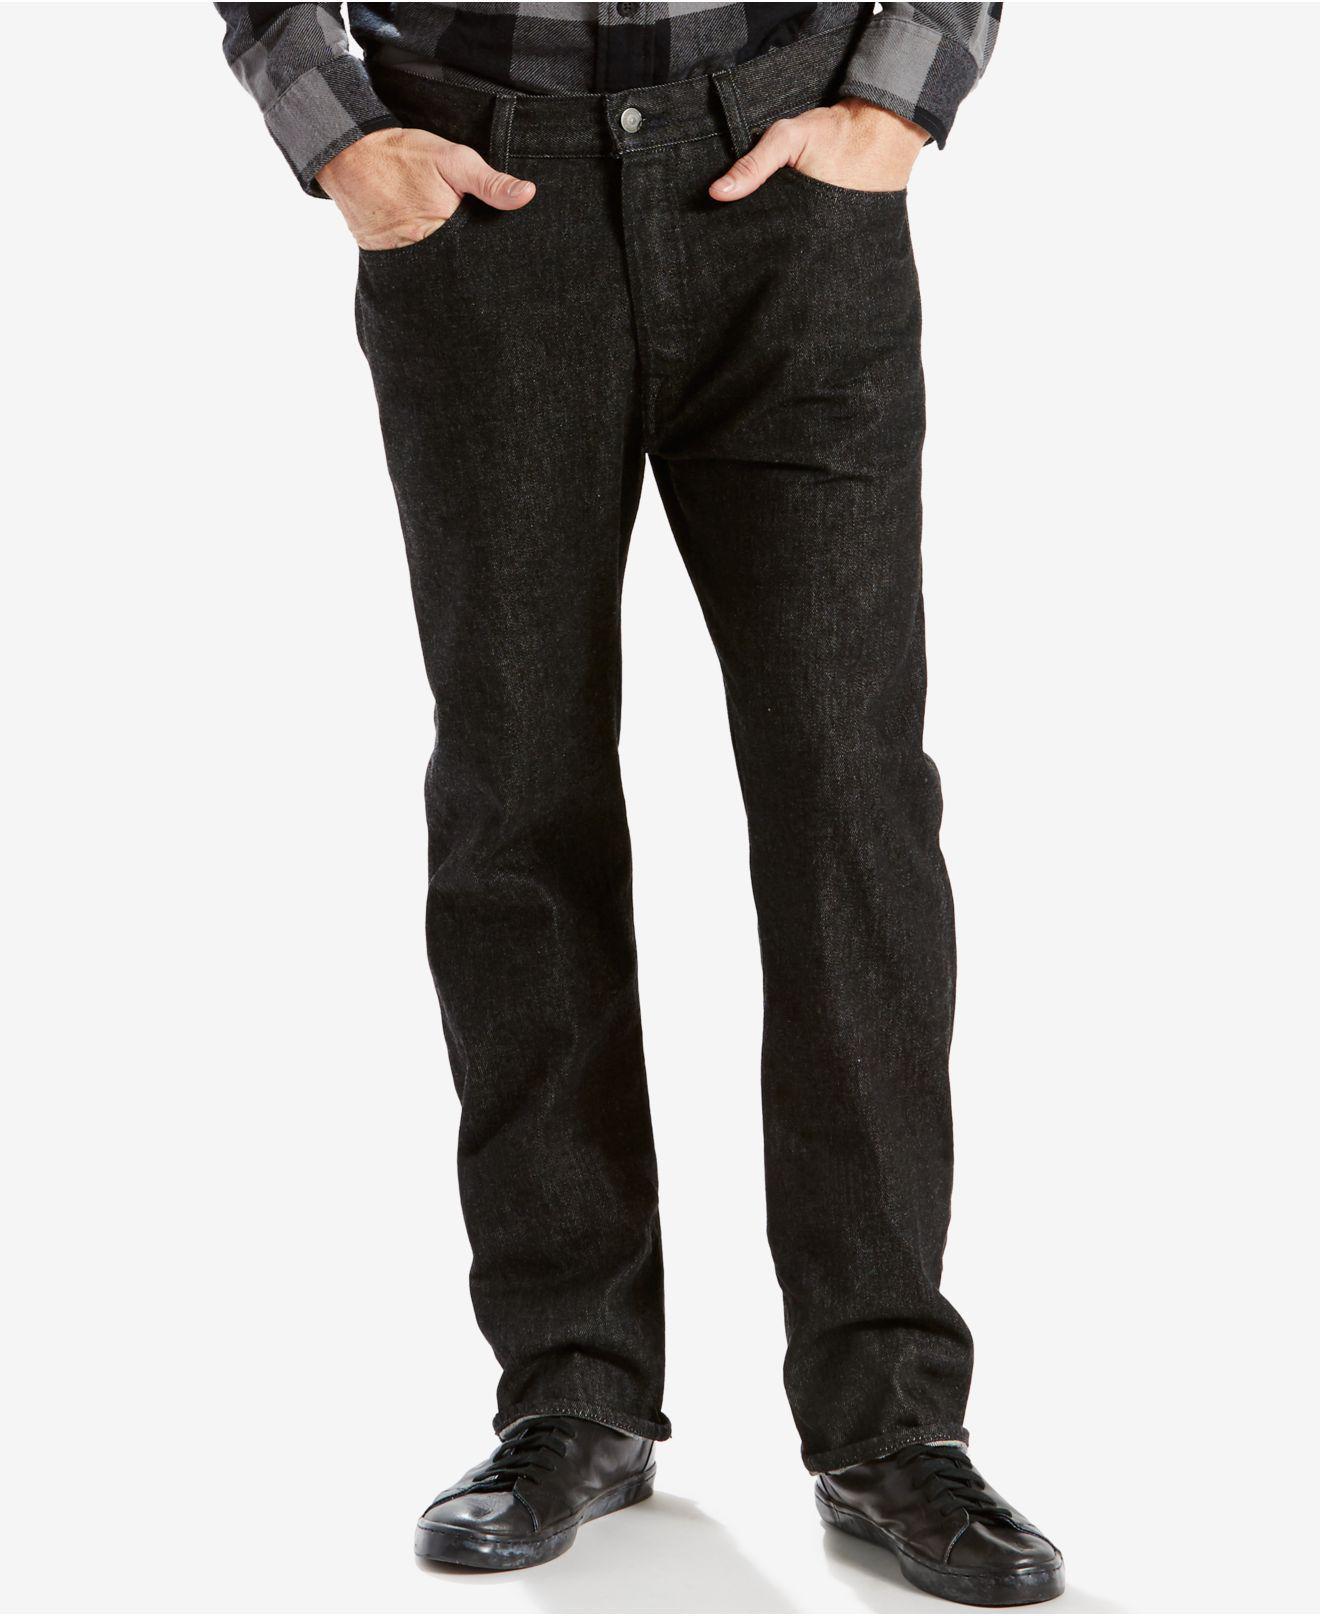 4c87ac0d Lyst - Levi's 501 Original-fit Jeans in Black for Men